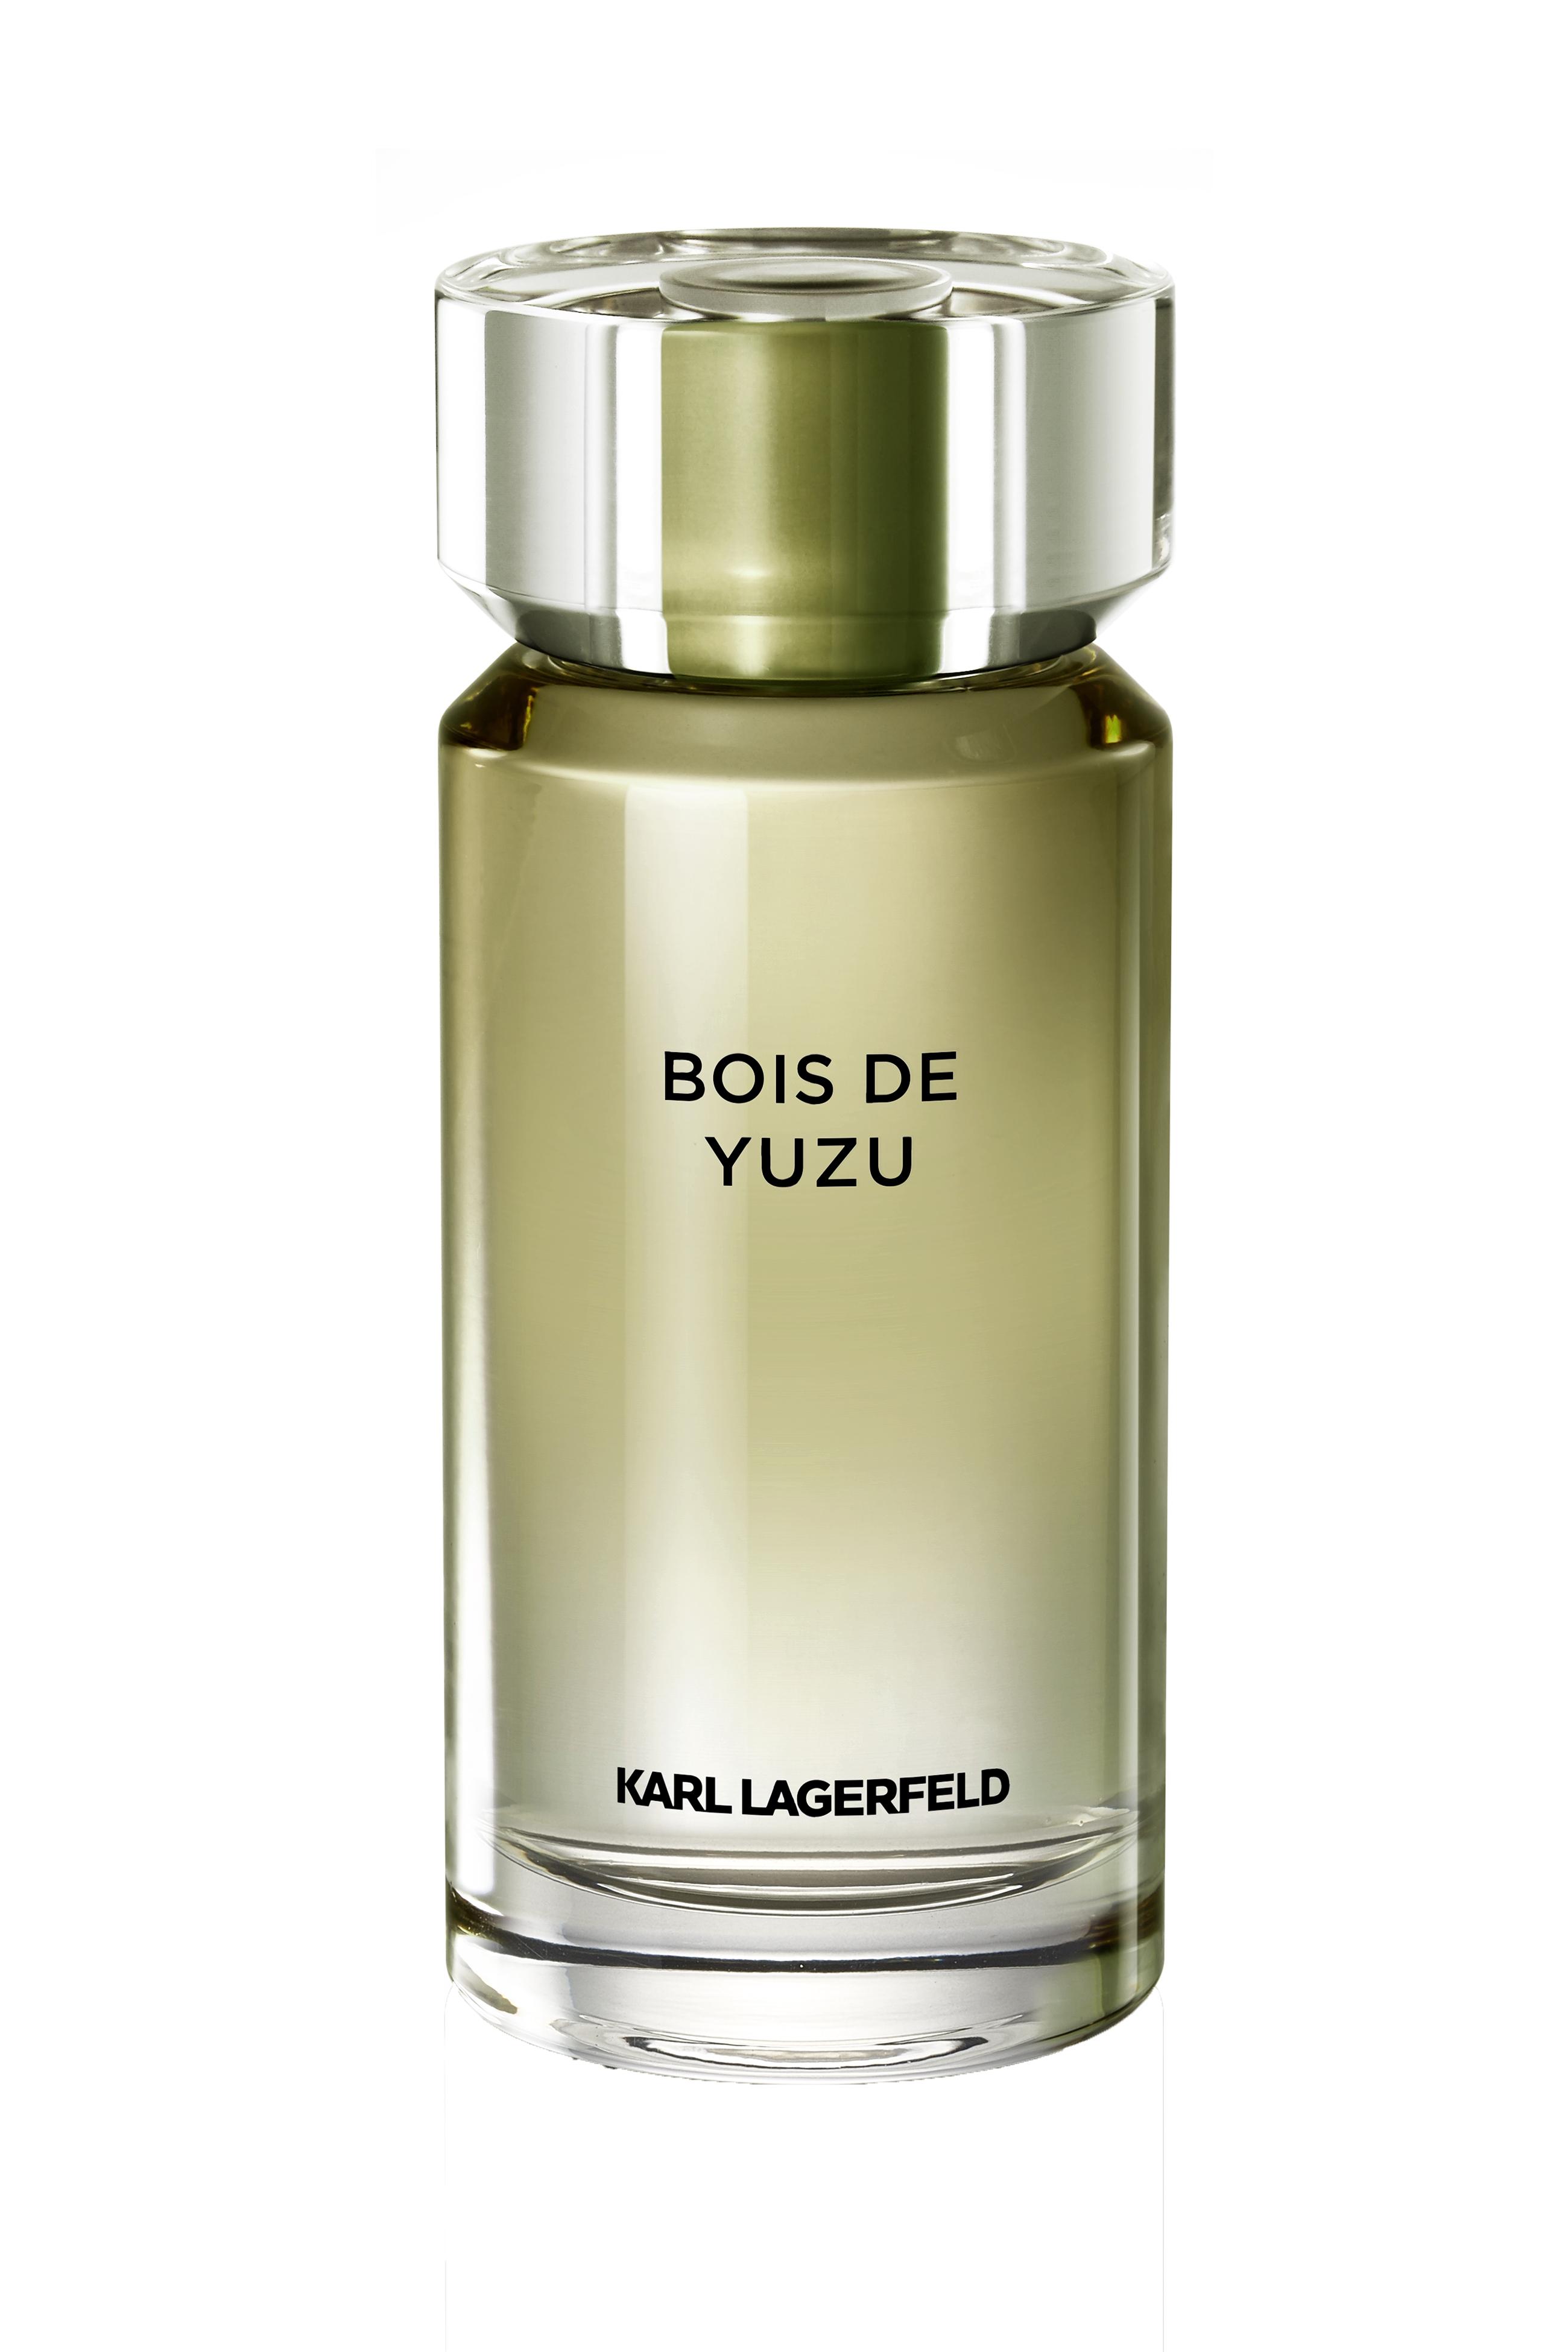 Karl Lagerfeld Bois De Yuzu EDT, 100 ml